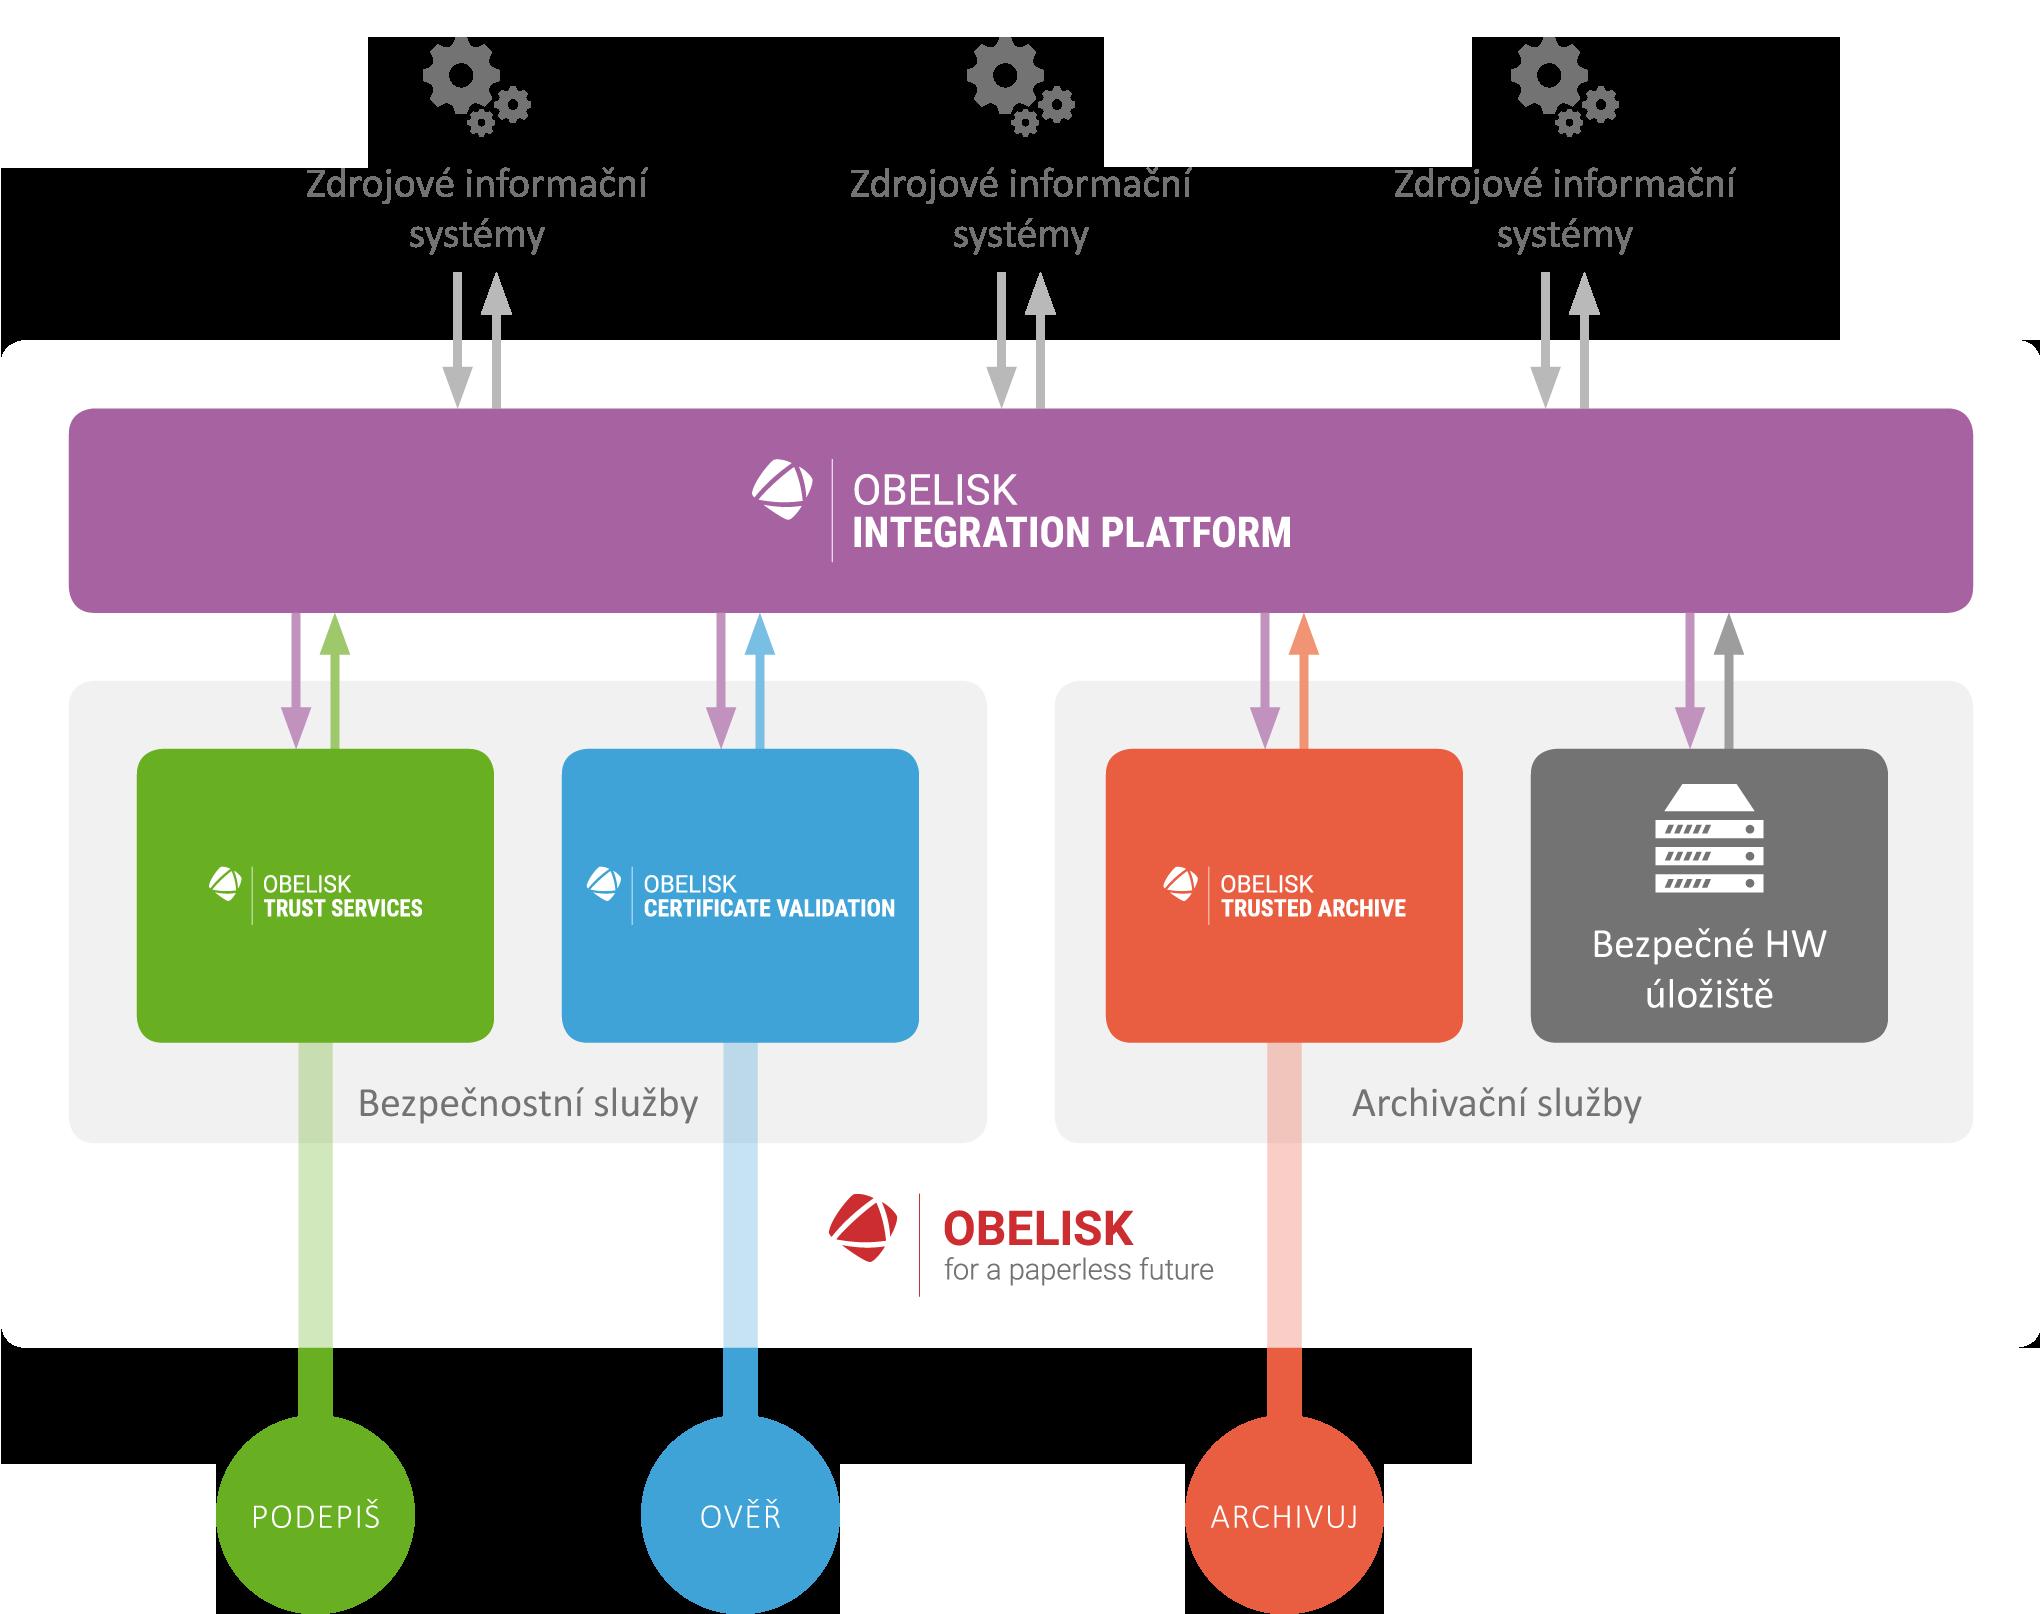 sefira-obelisk-integration-platform-schema